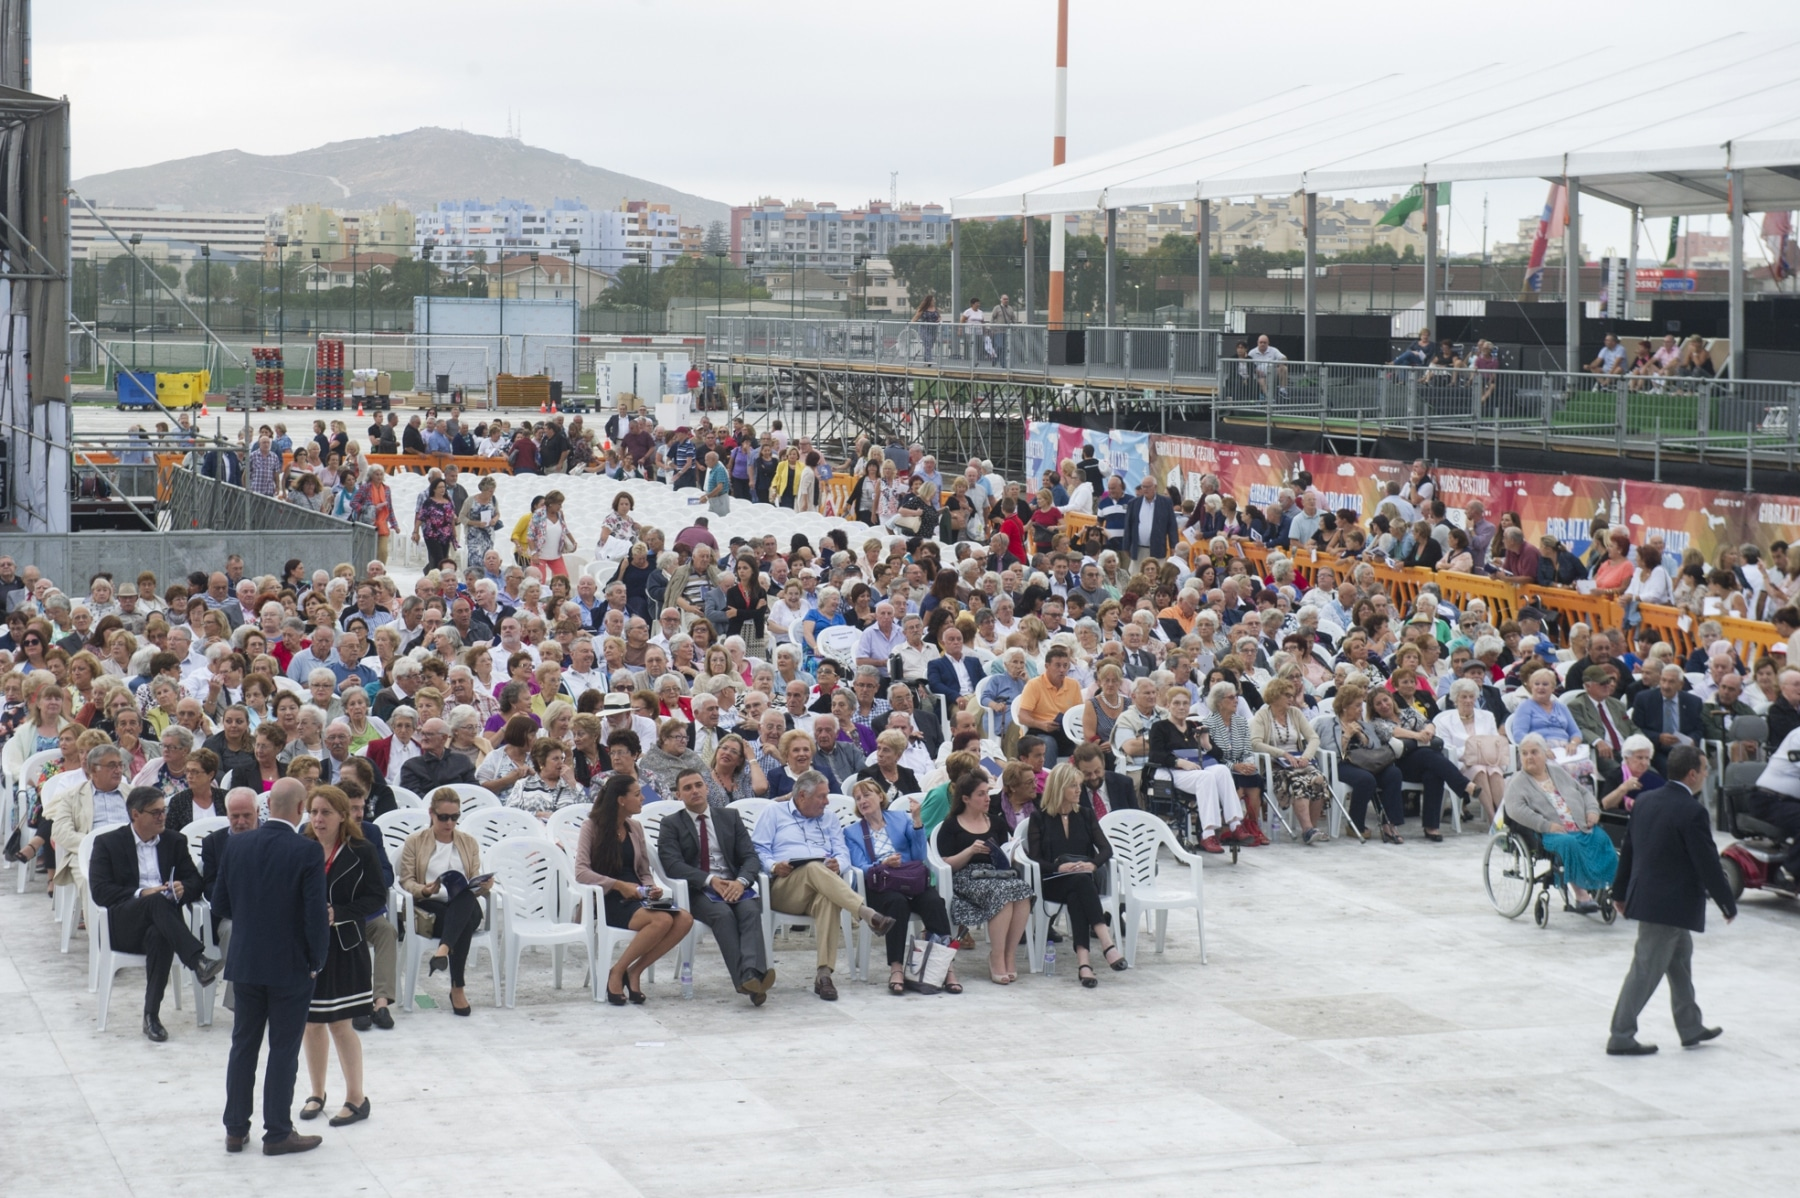 concierto-evacuados-de-gibraltar-07092015-14bn_21246898631_o